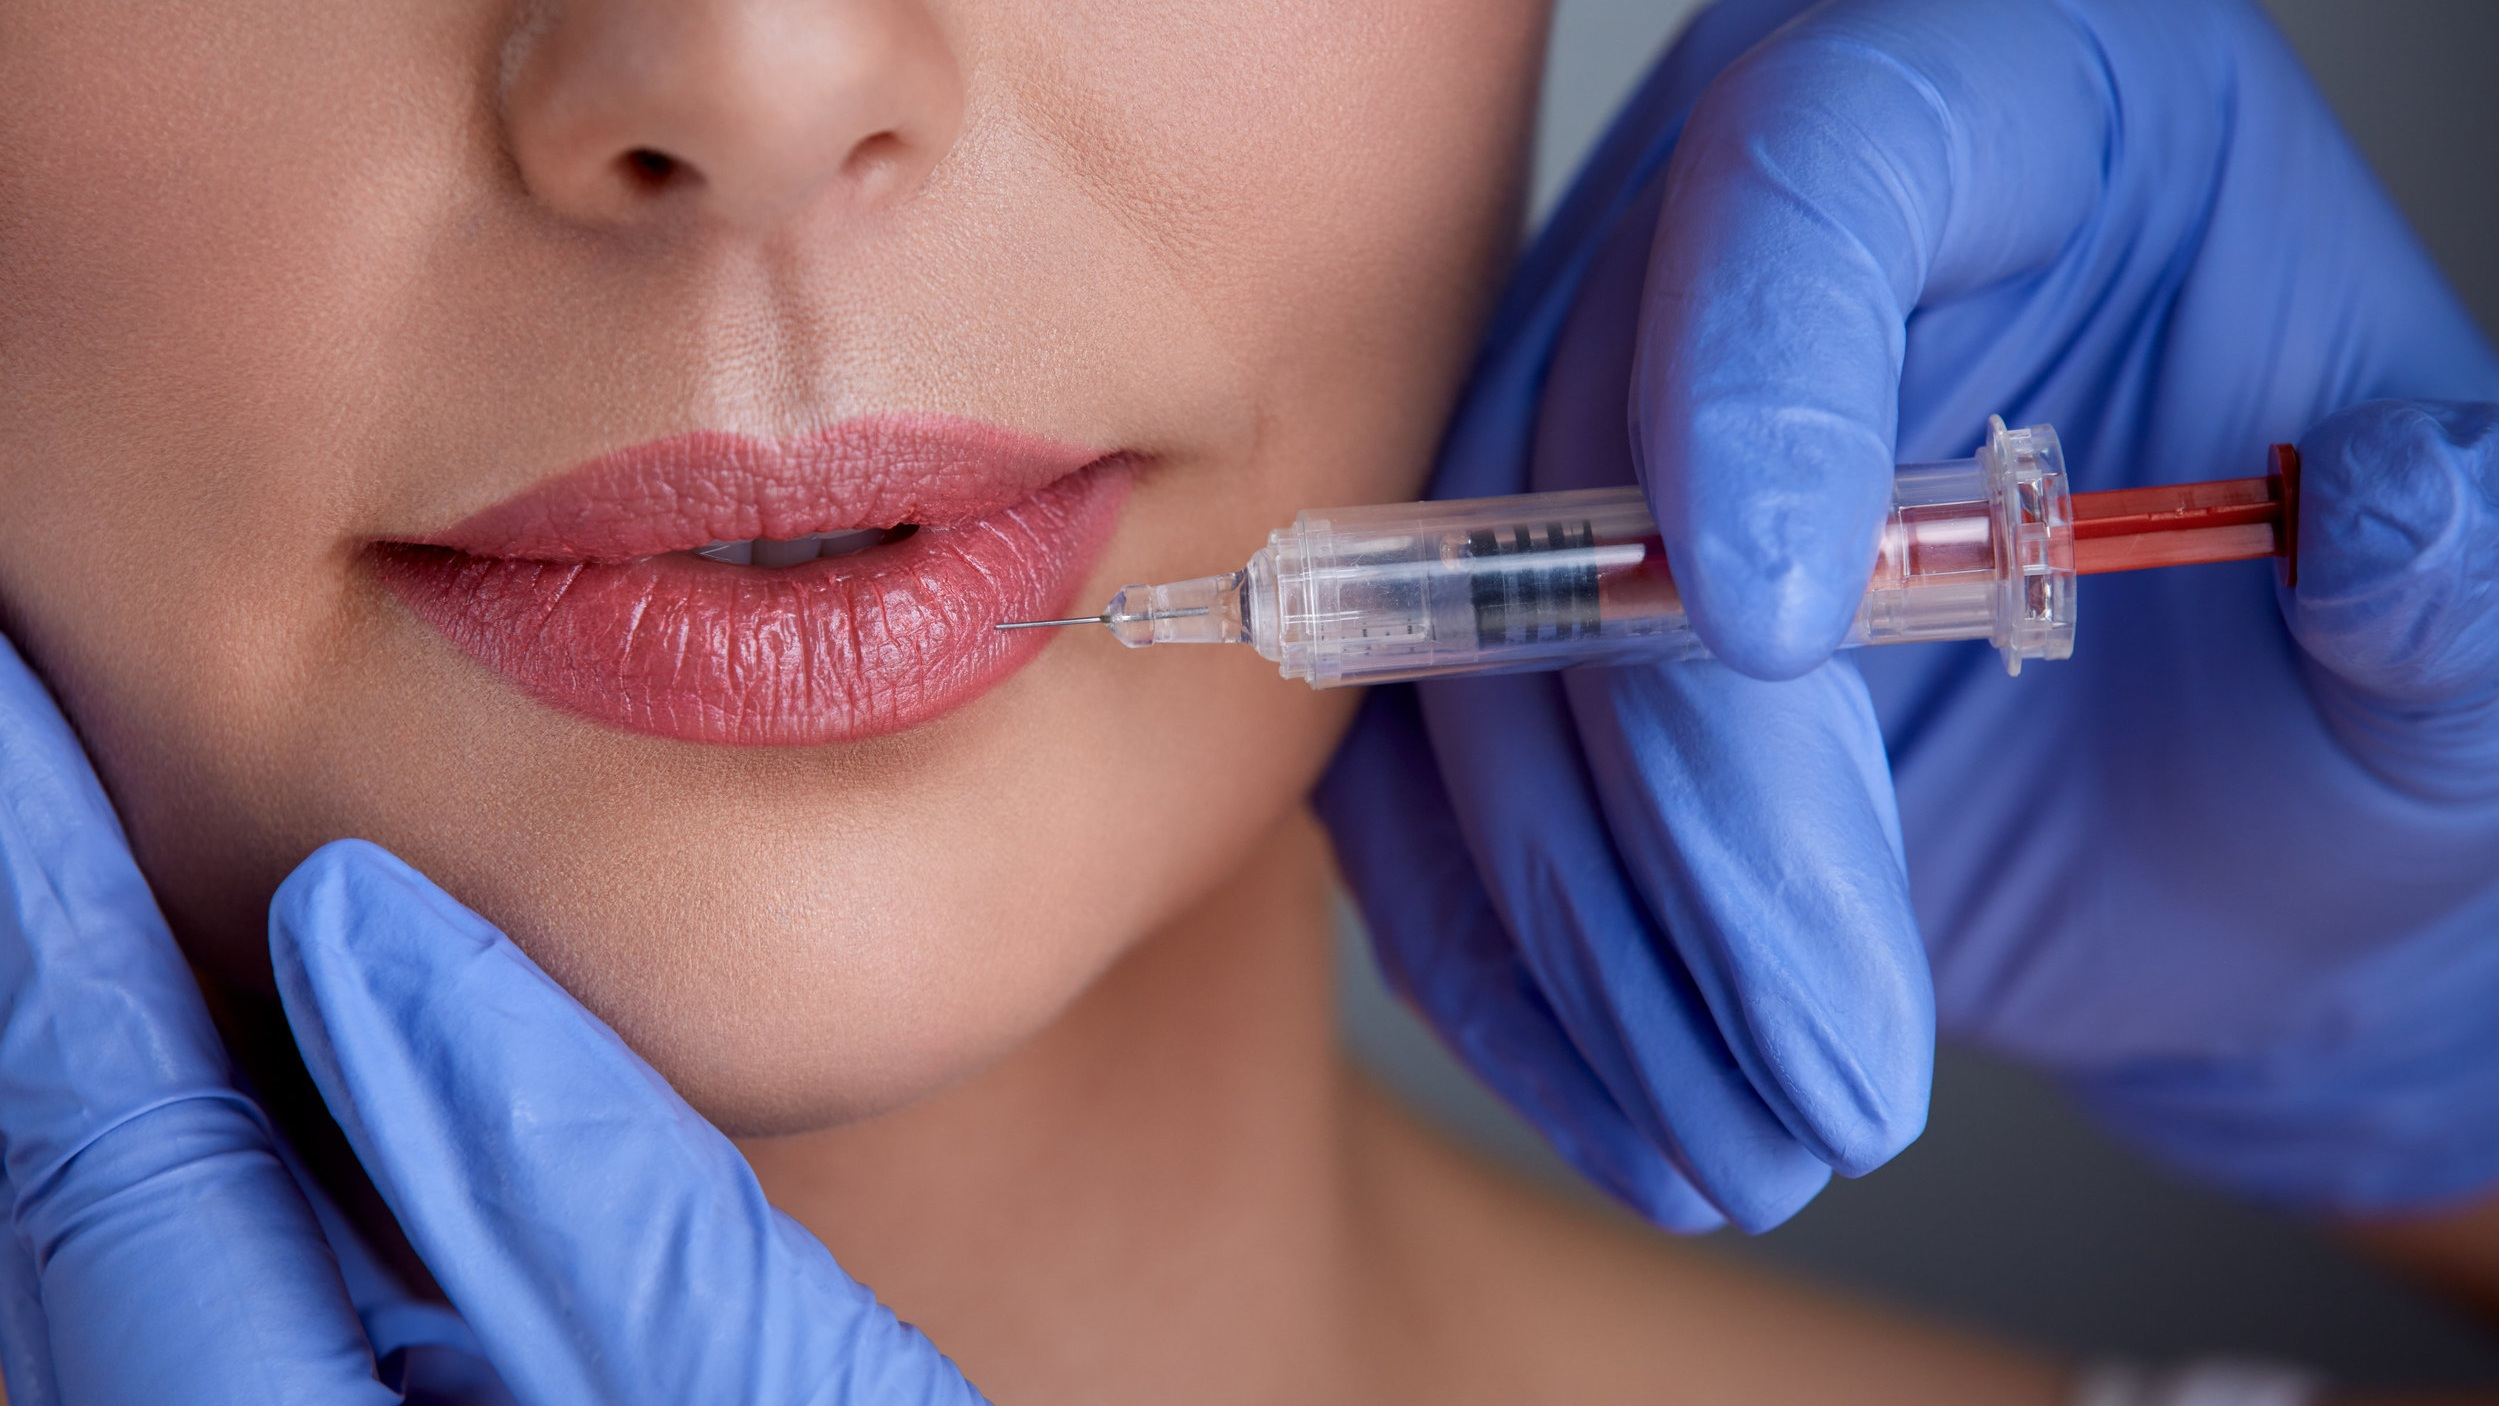 rsz_hands-of-expert-injecting-botox-pzx72pn.jpg